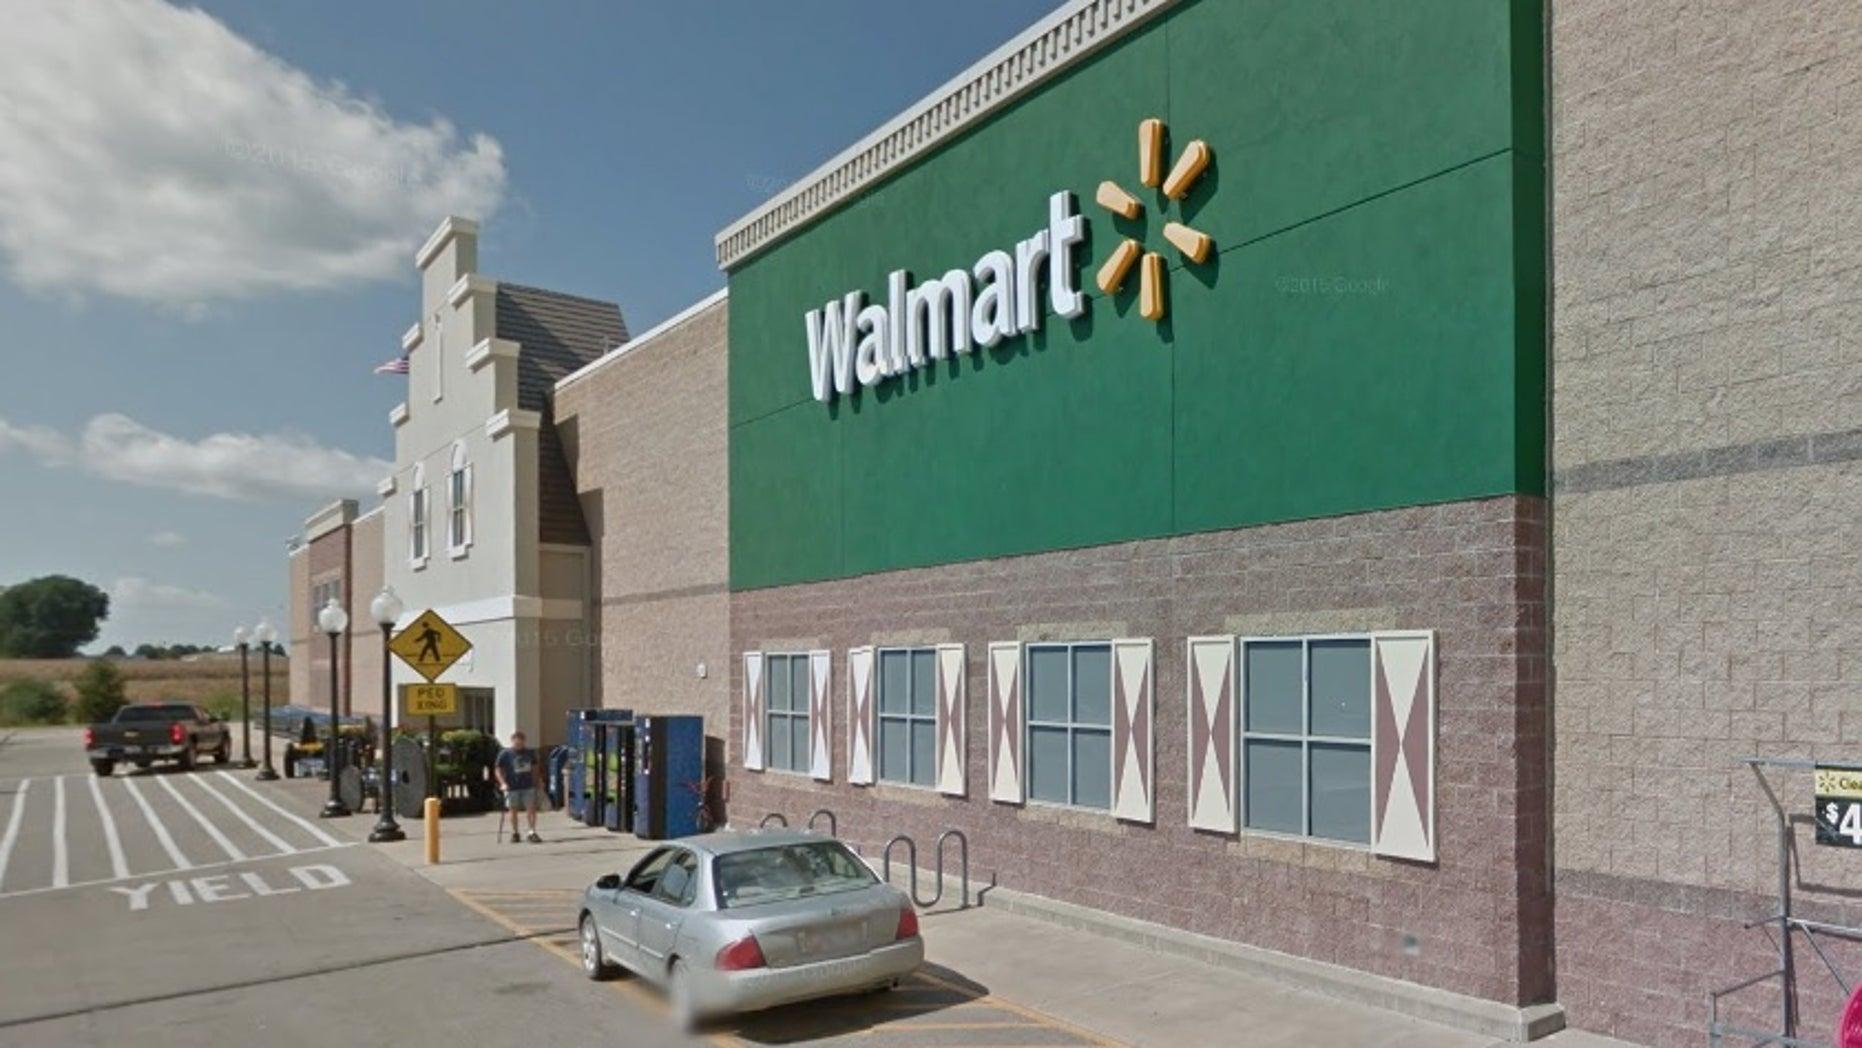 The Walmart in Pella, Iowa.